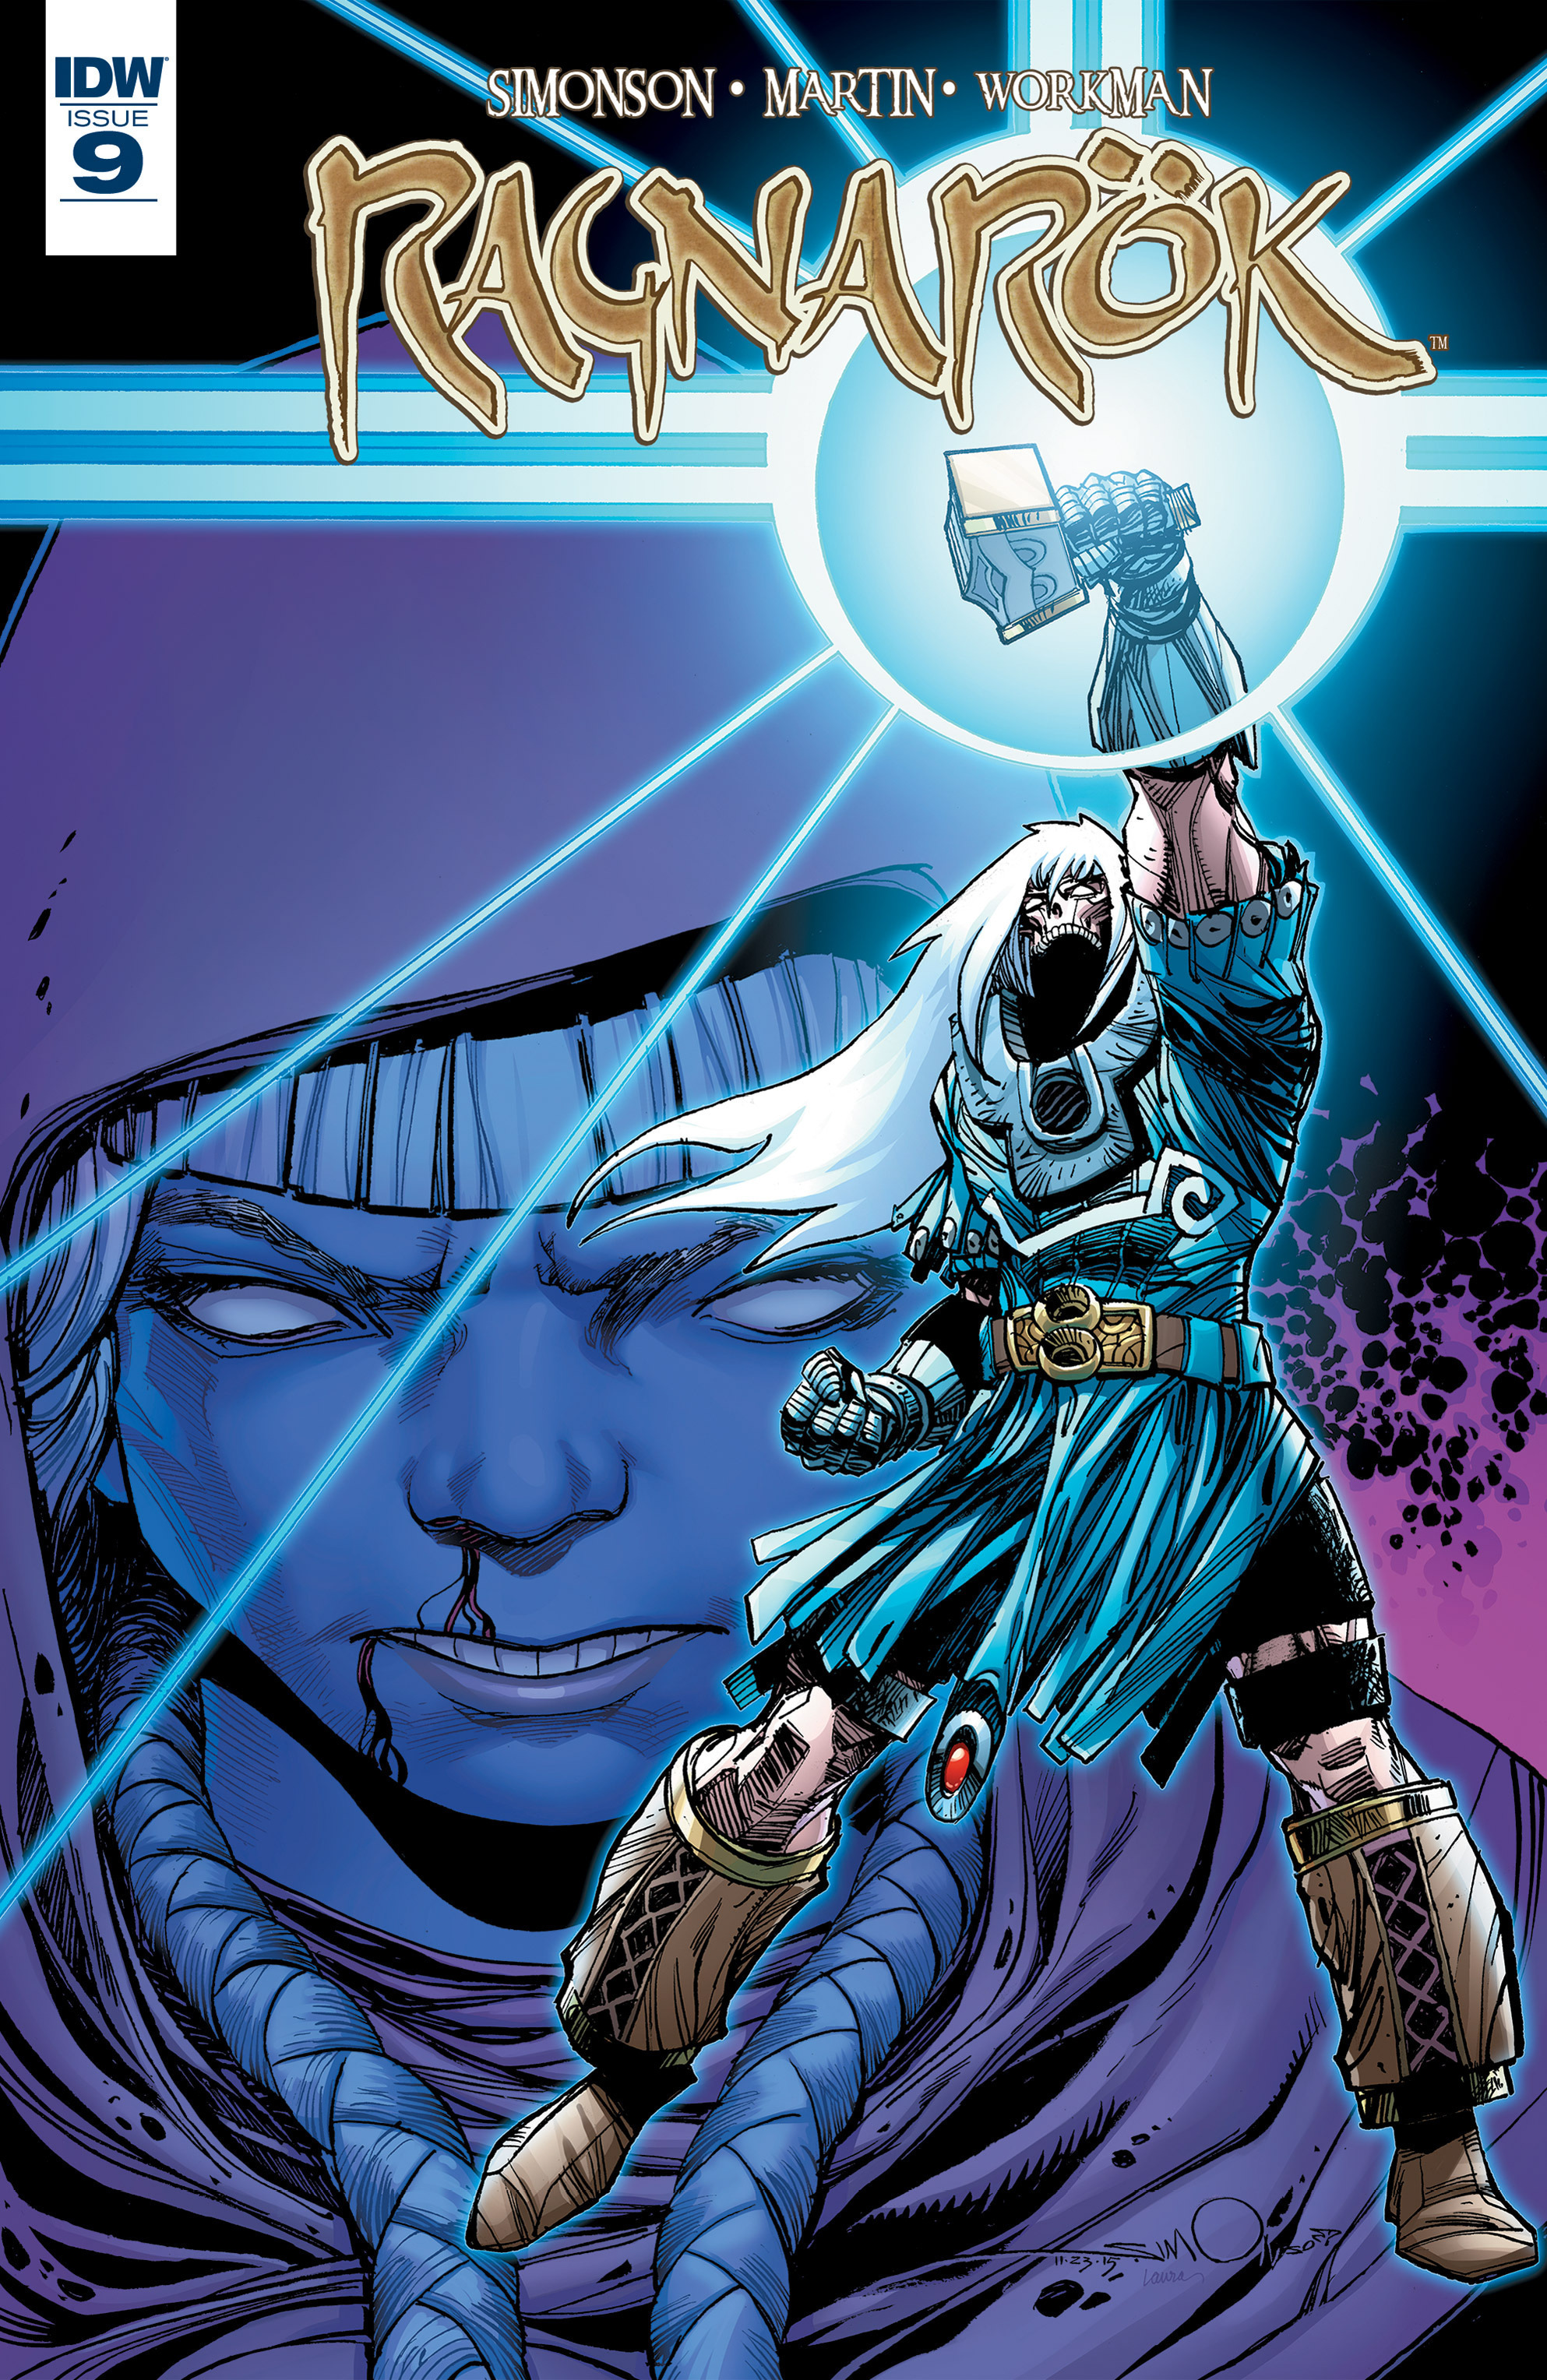 Read online Ragnarok comic -  Issue #9 - 1